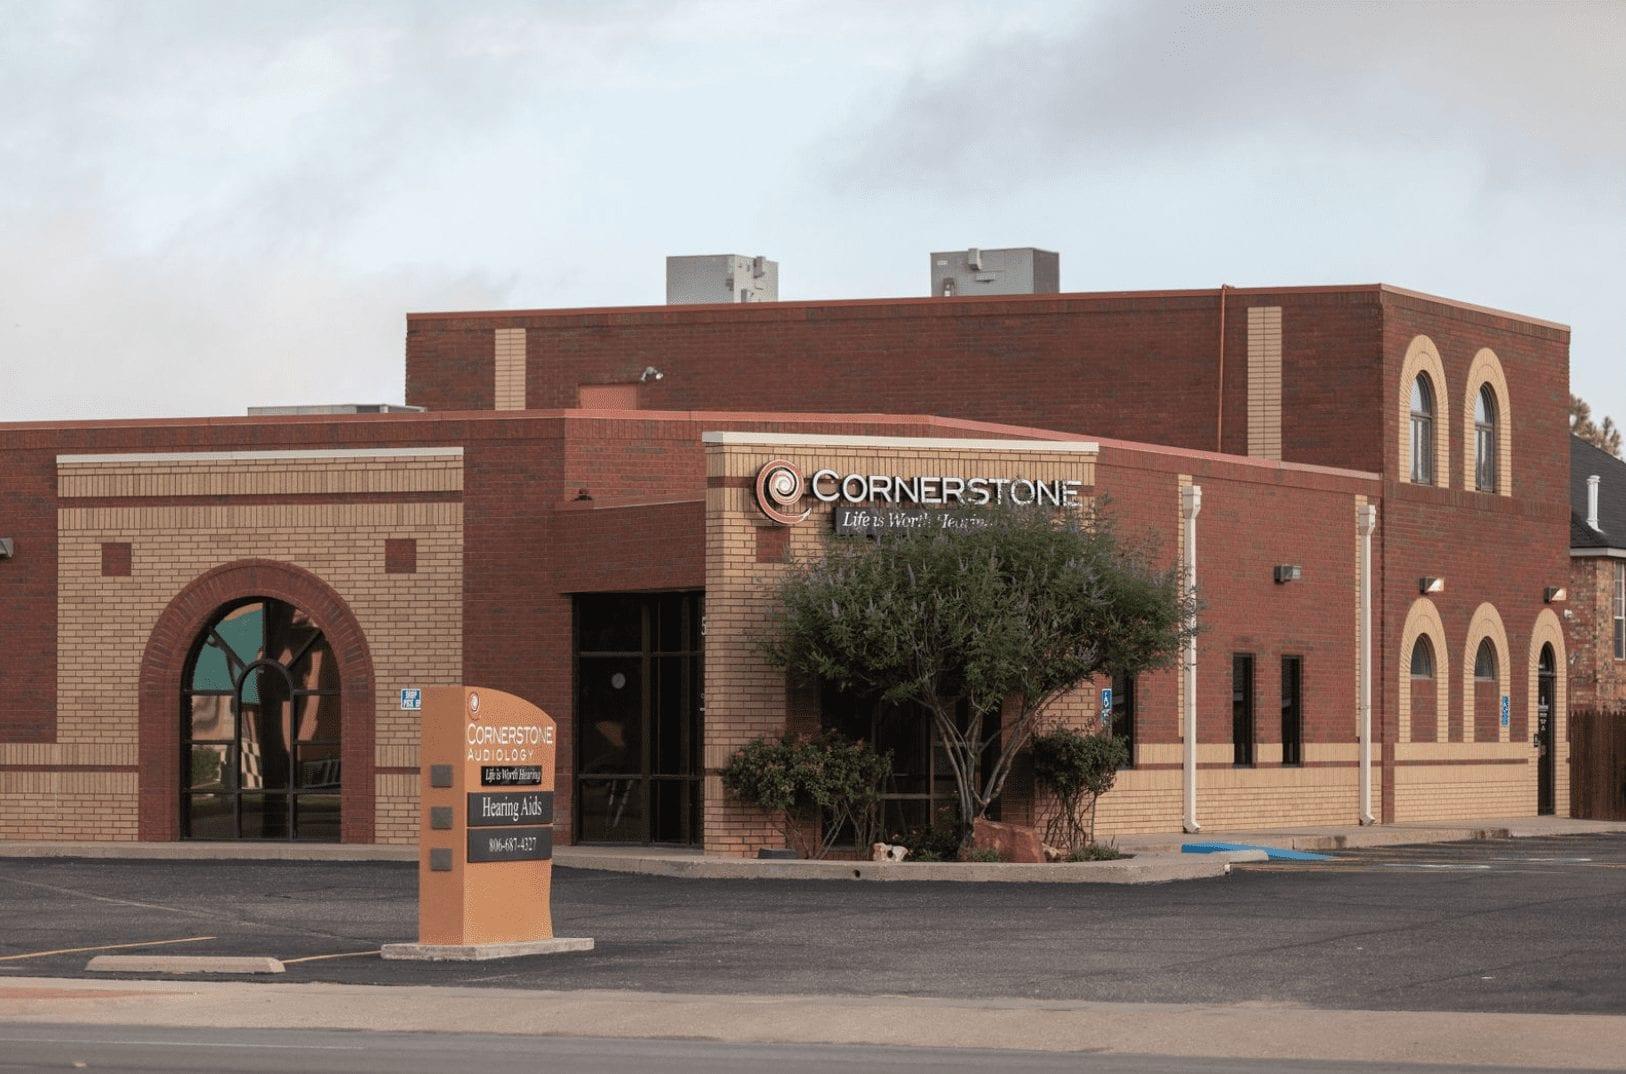 Cornerstone Audiology building in Lubbock, Texas.